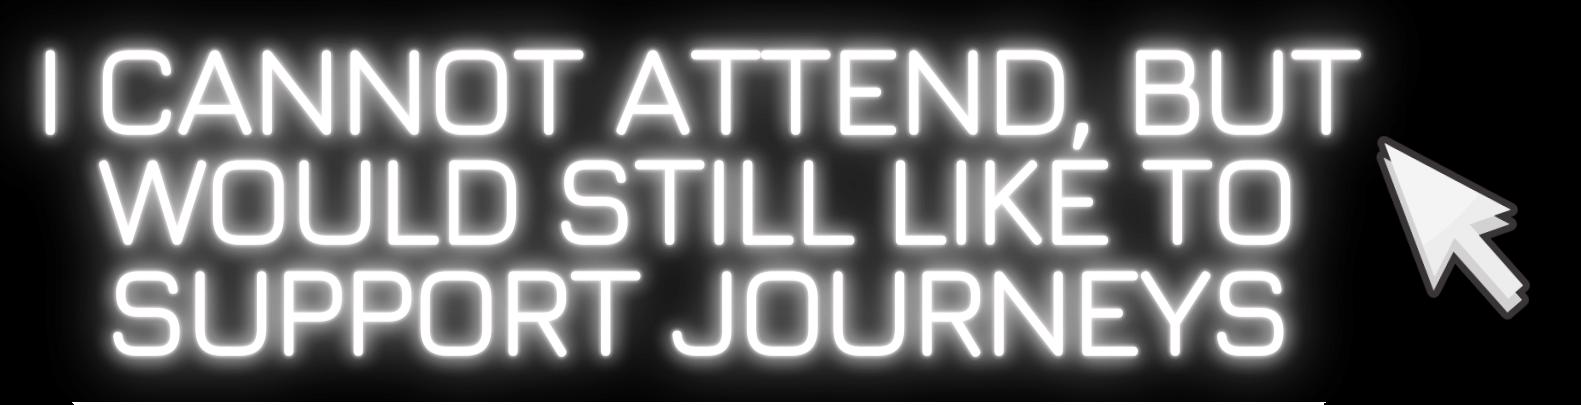 Journeys 2020